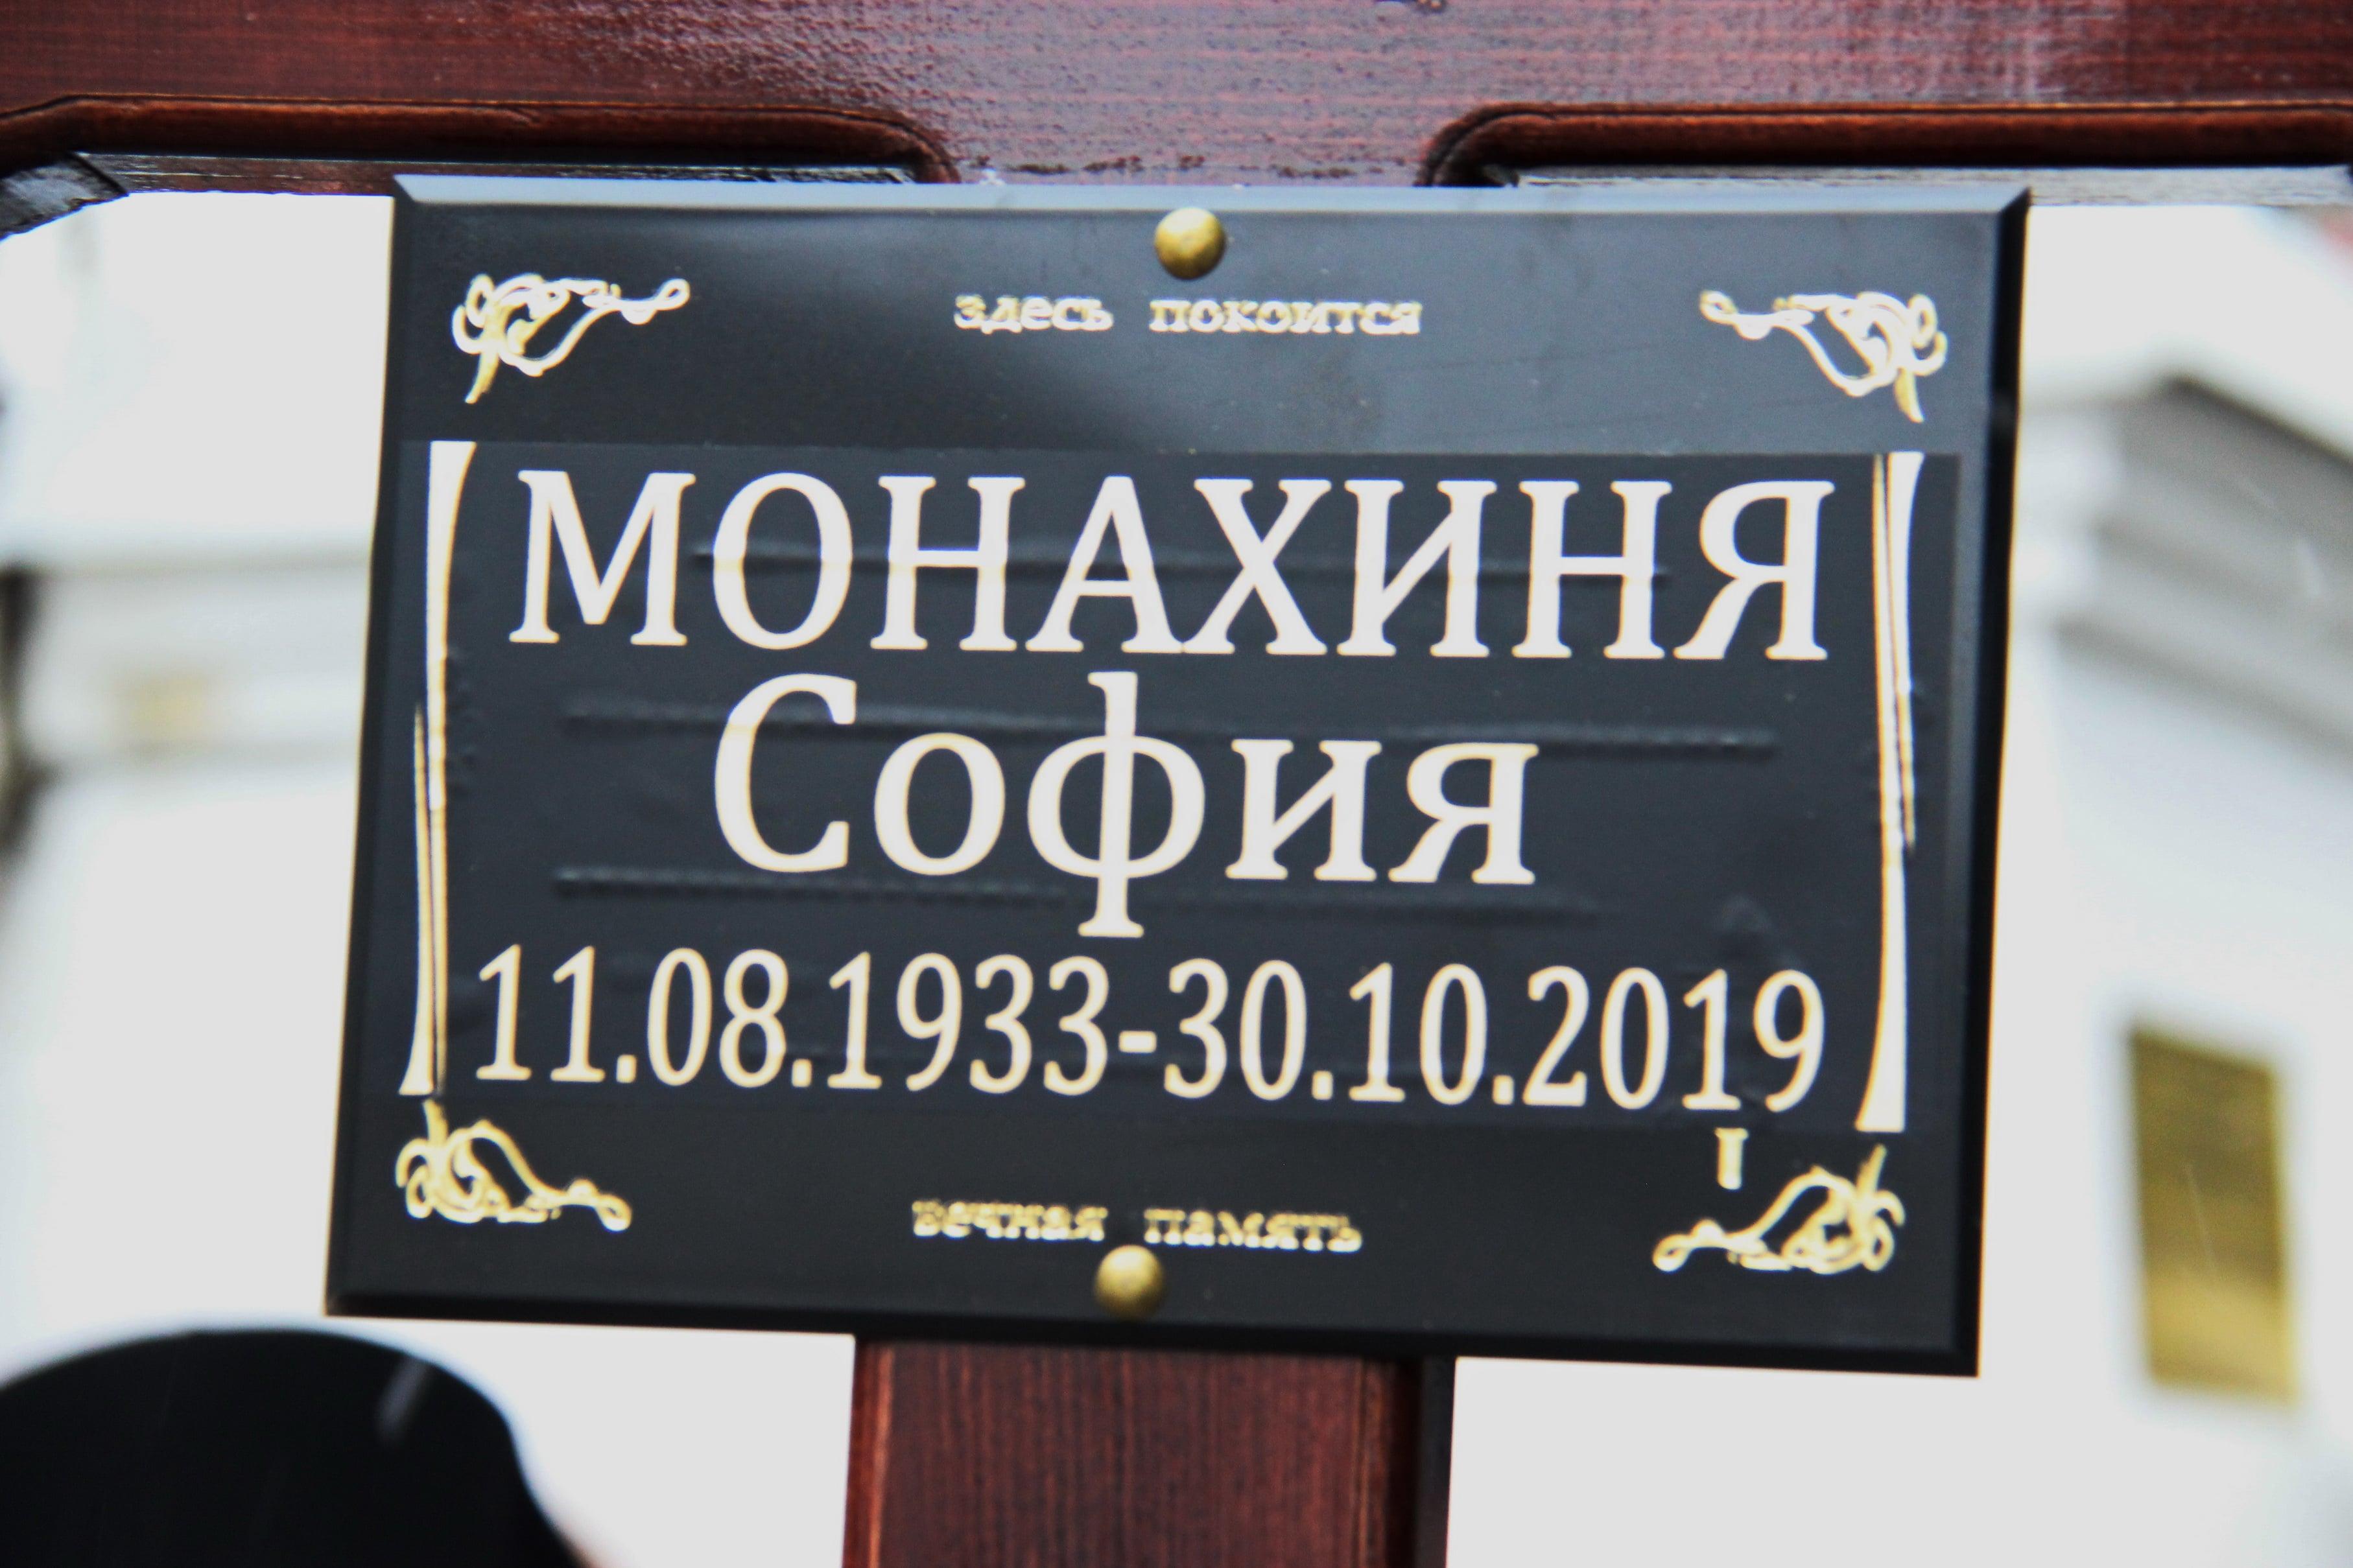 http://monuspen.ru/photoreports/fca094e09bd3198dcb9220536580031n.JPG